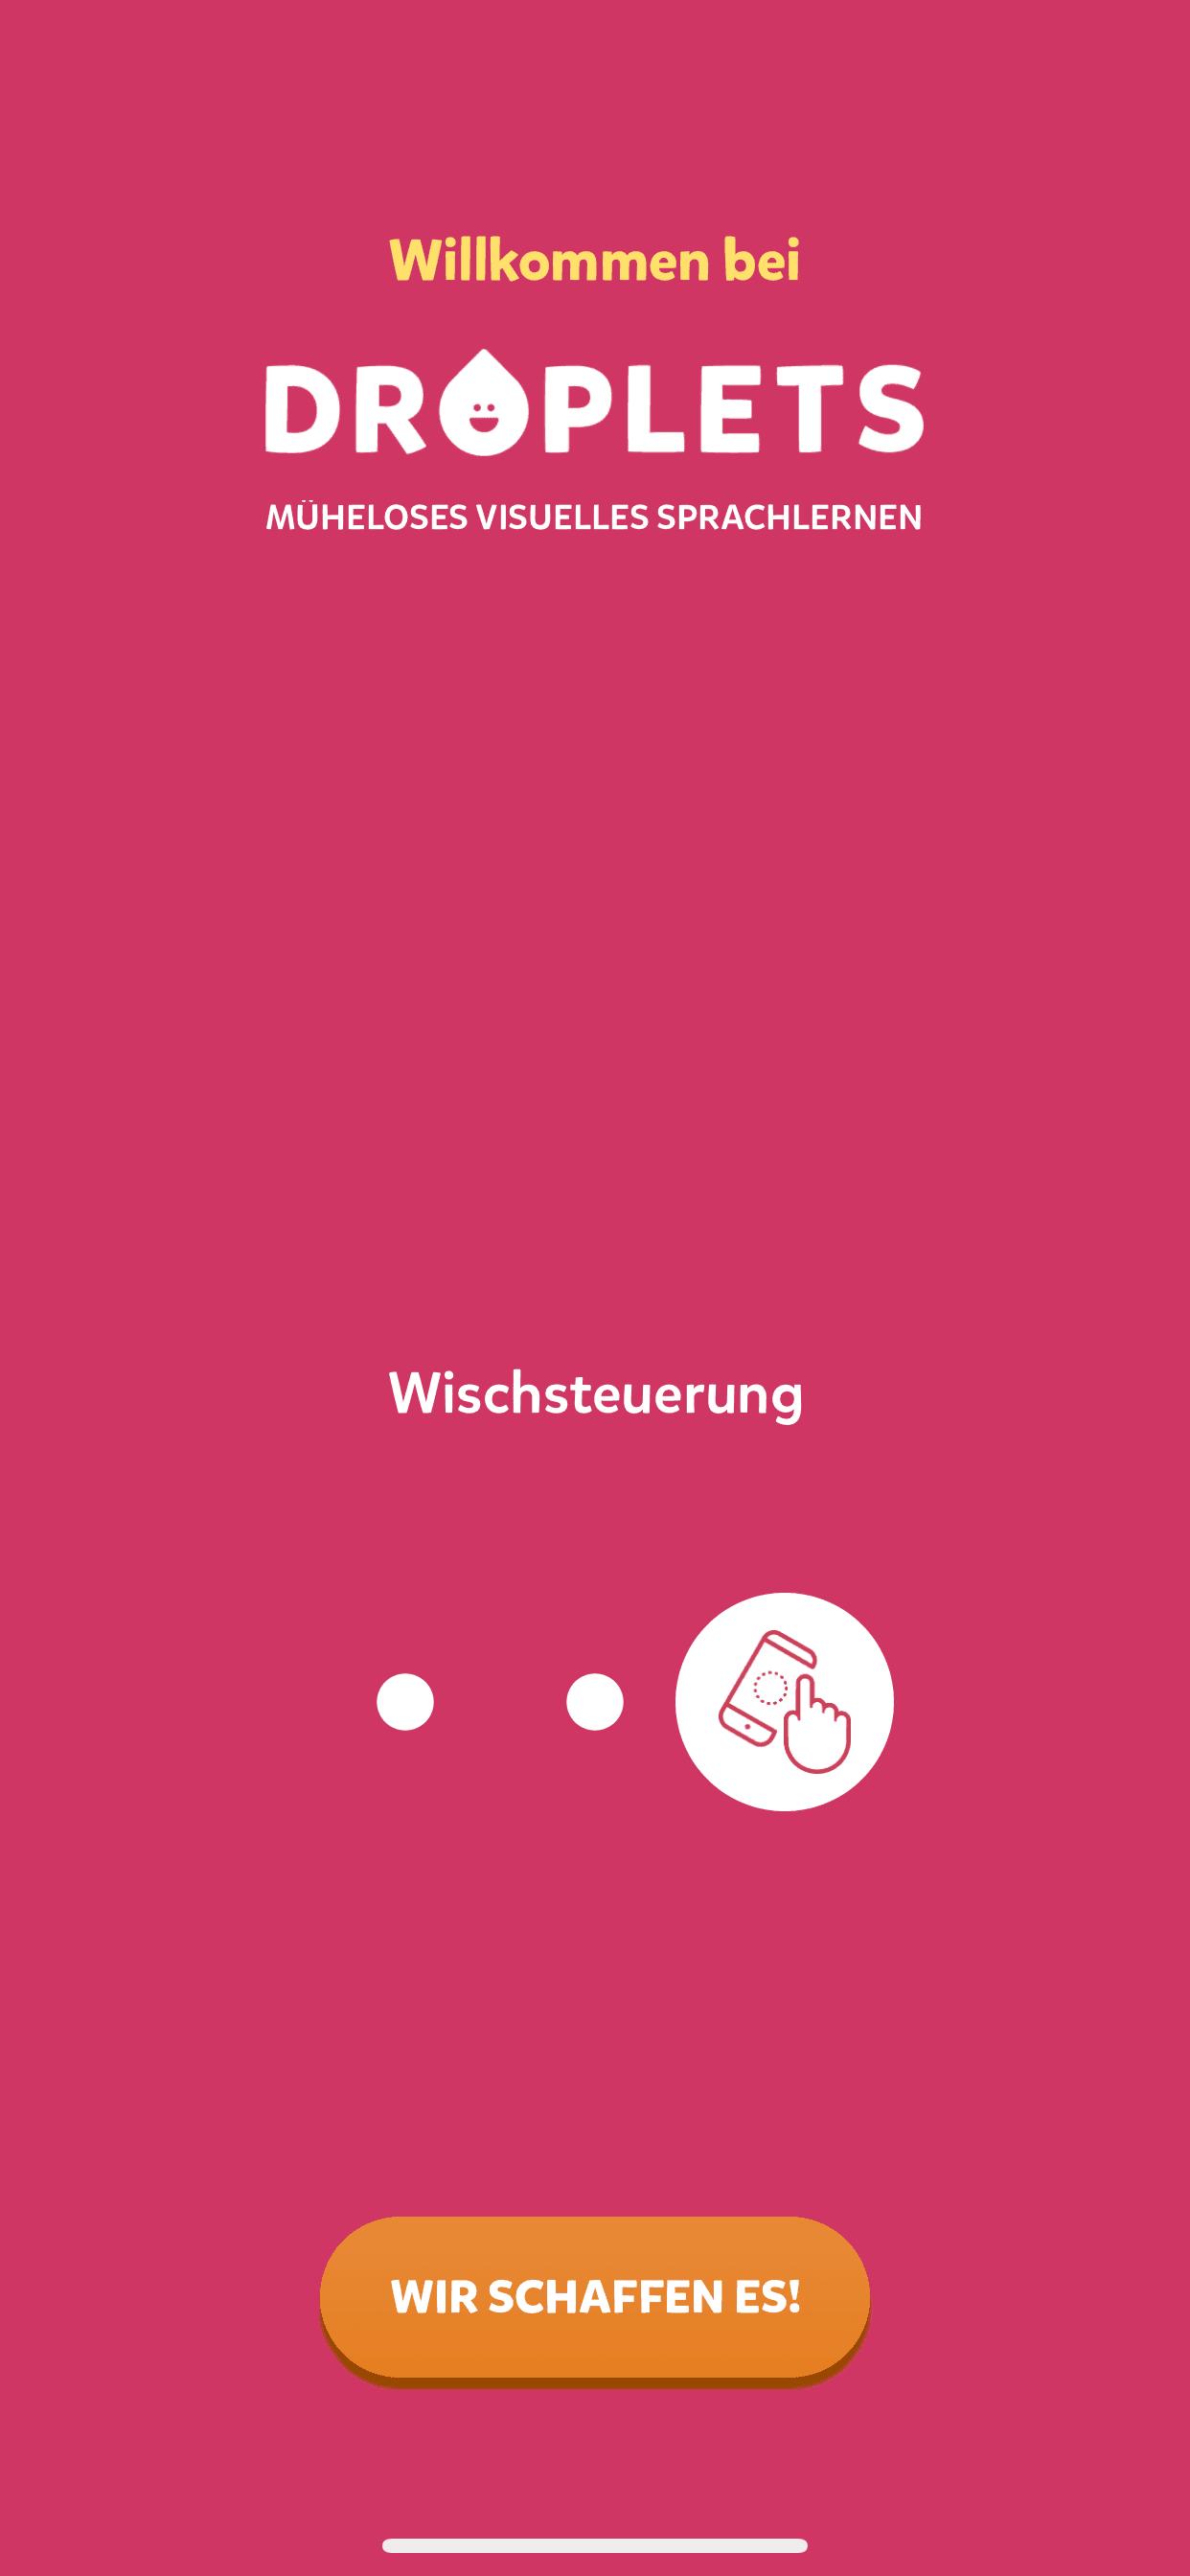 Droplets App (iOS): Sprachen lernen für Kinder 6 techboys.de • smarte News, auf den Punkt! Droplets App (iOS): Sprachen lernen für Kinder